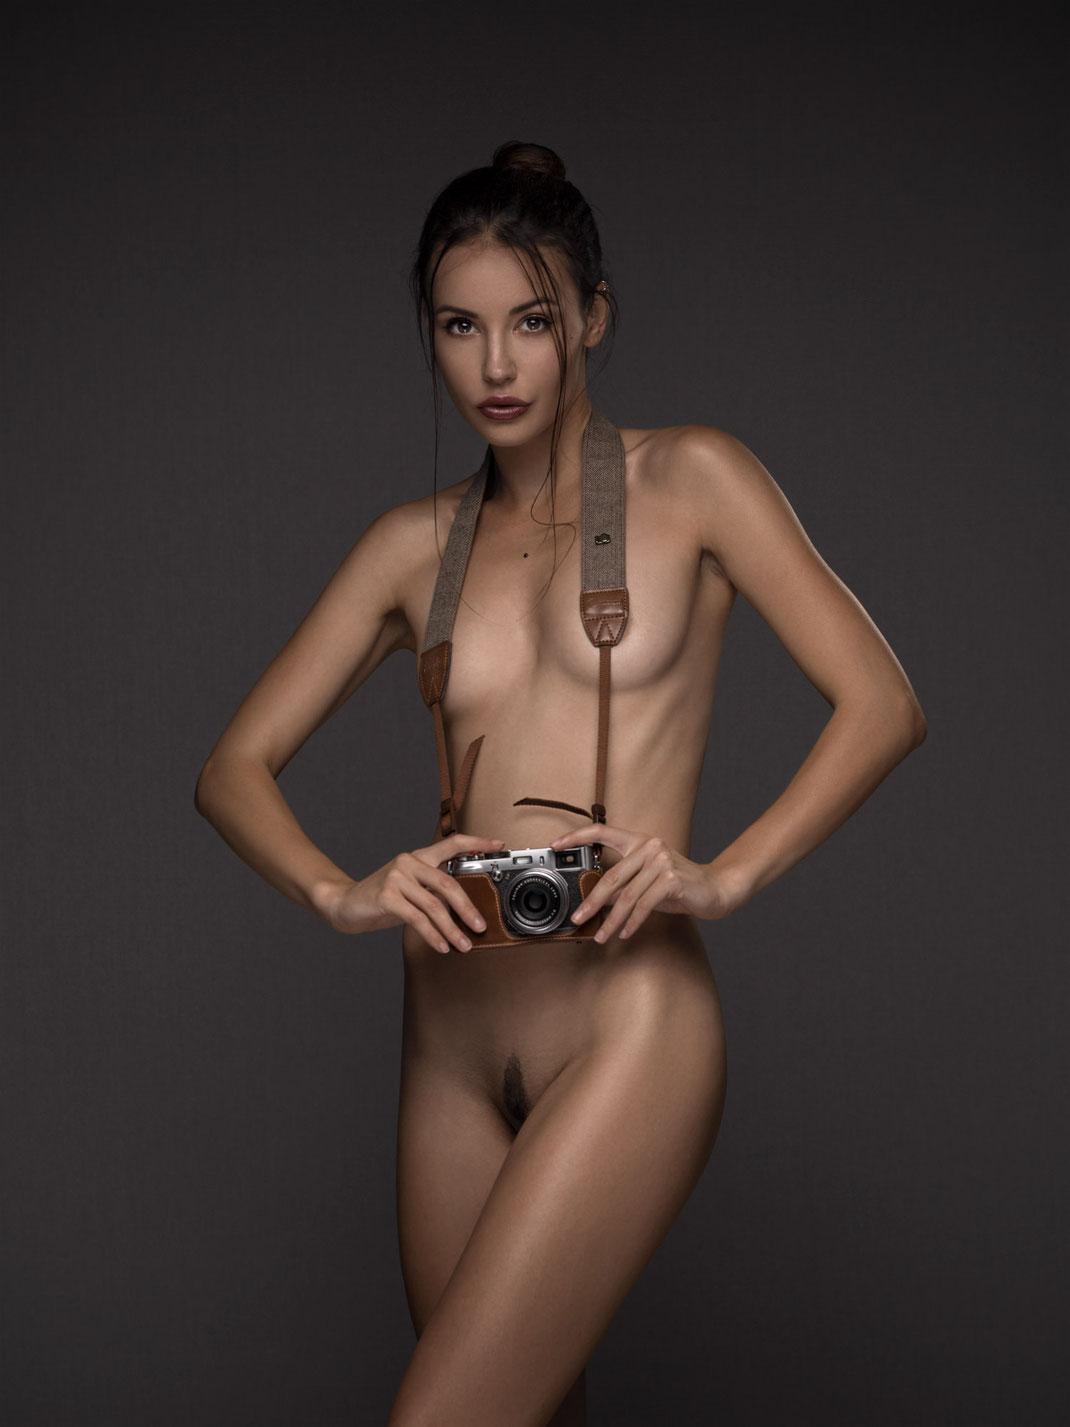 Two Beauties - Eliska & Fuji X100s  - Markus Hertzsch